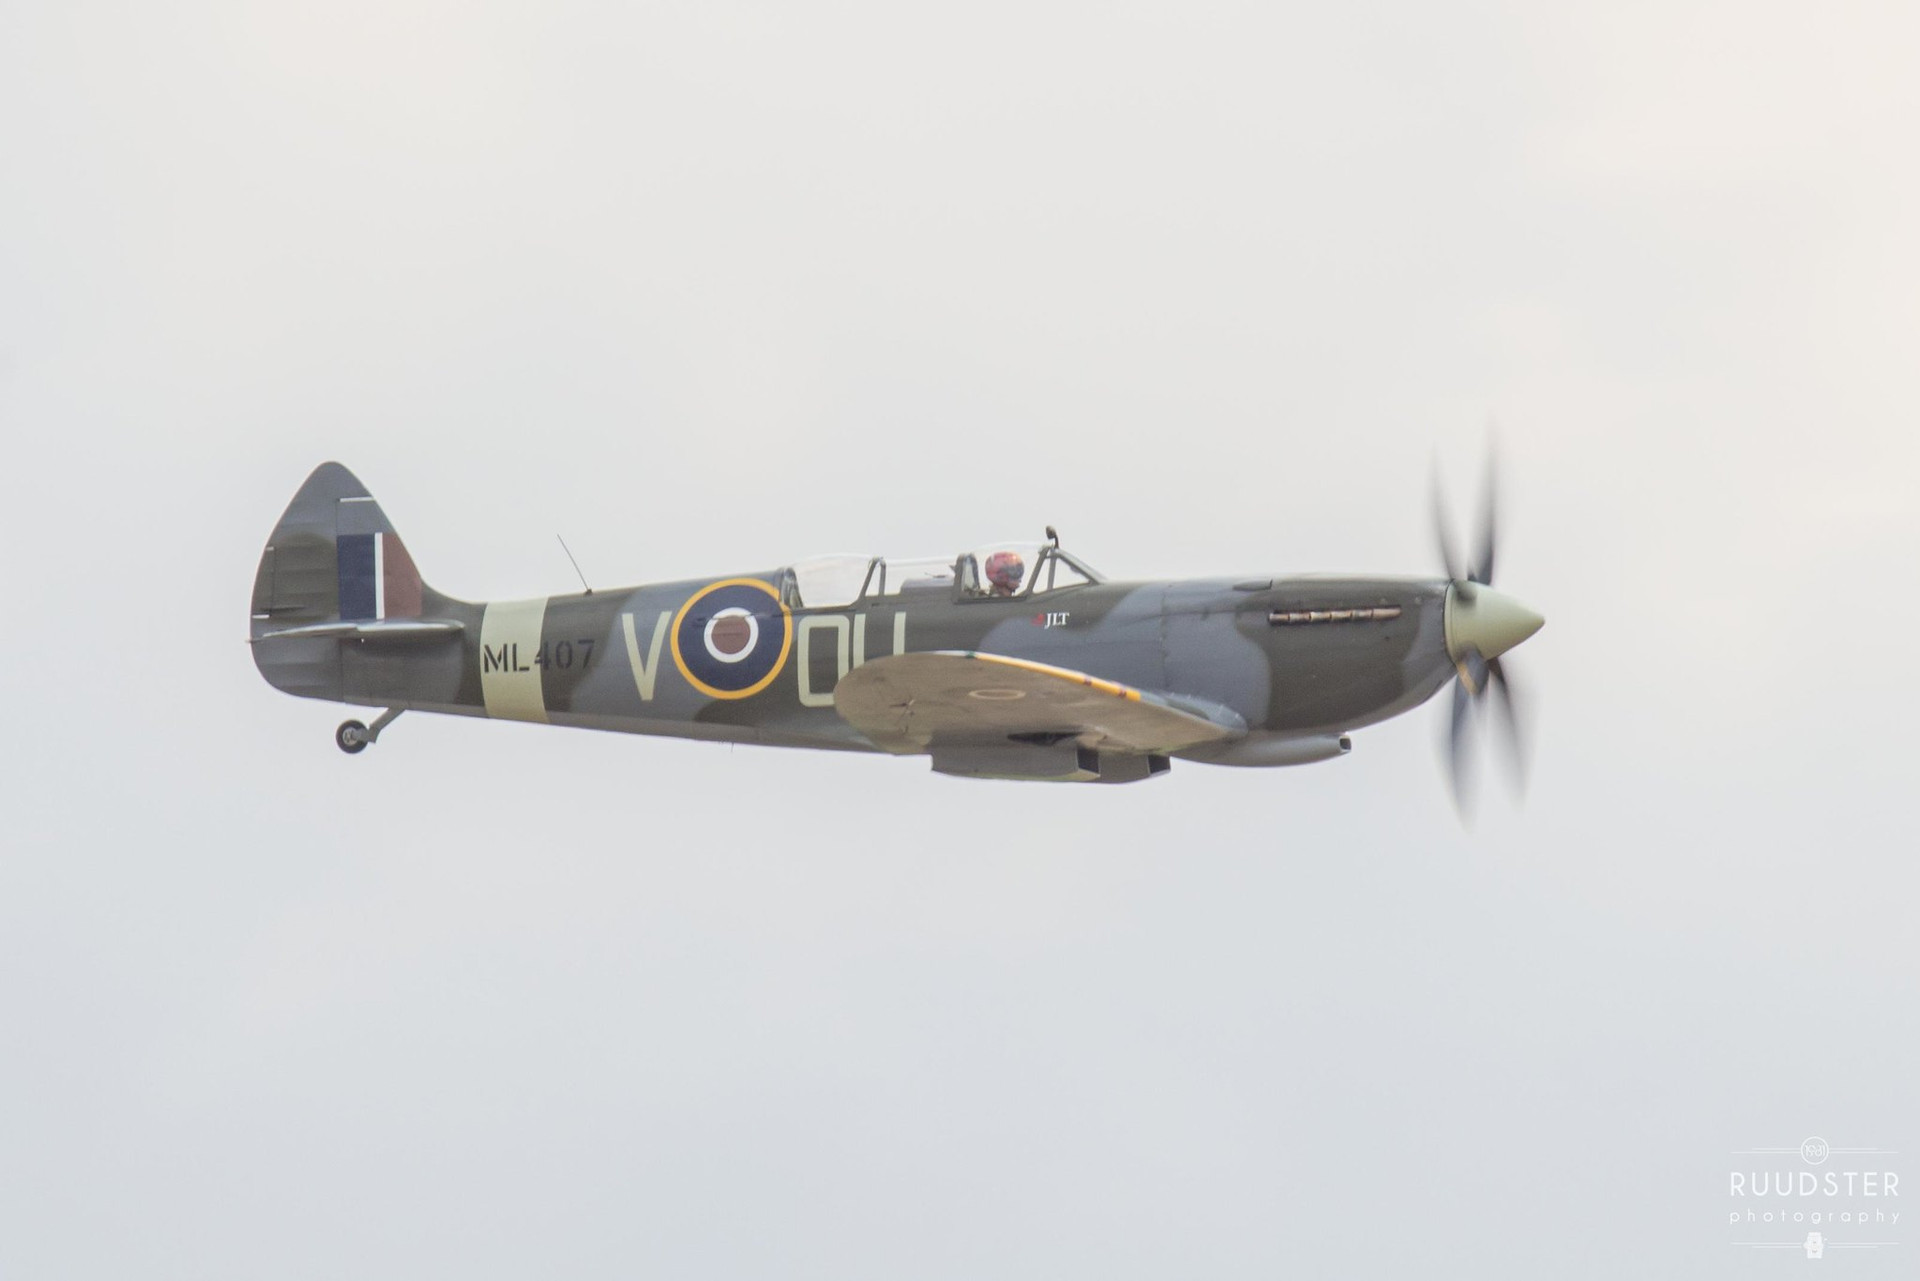 ML407   Build: 1944 - Supermarine Spitfire Mk.IX